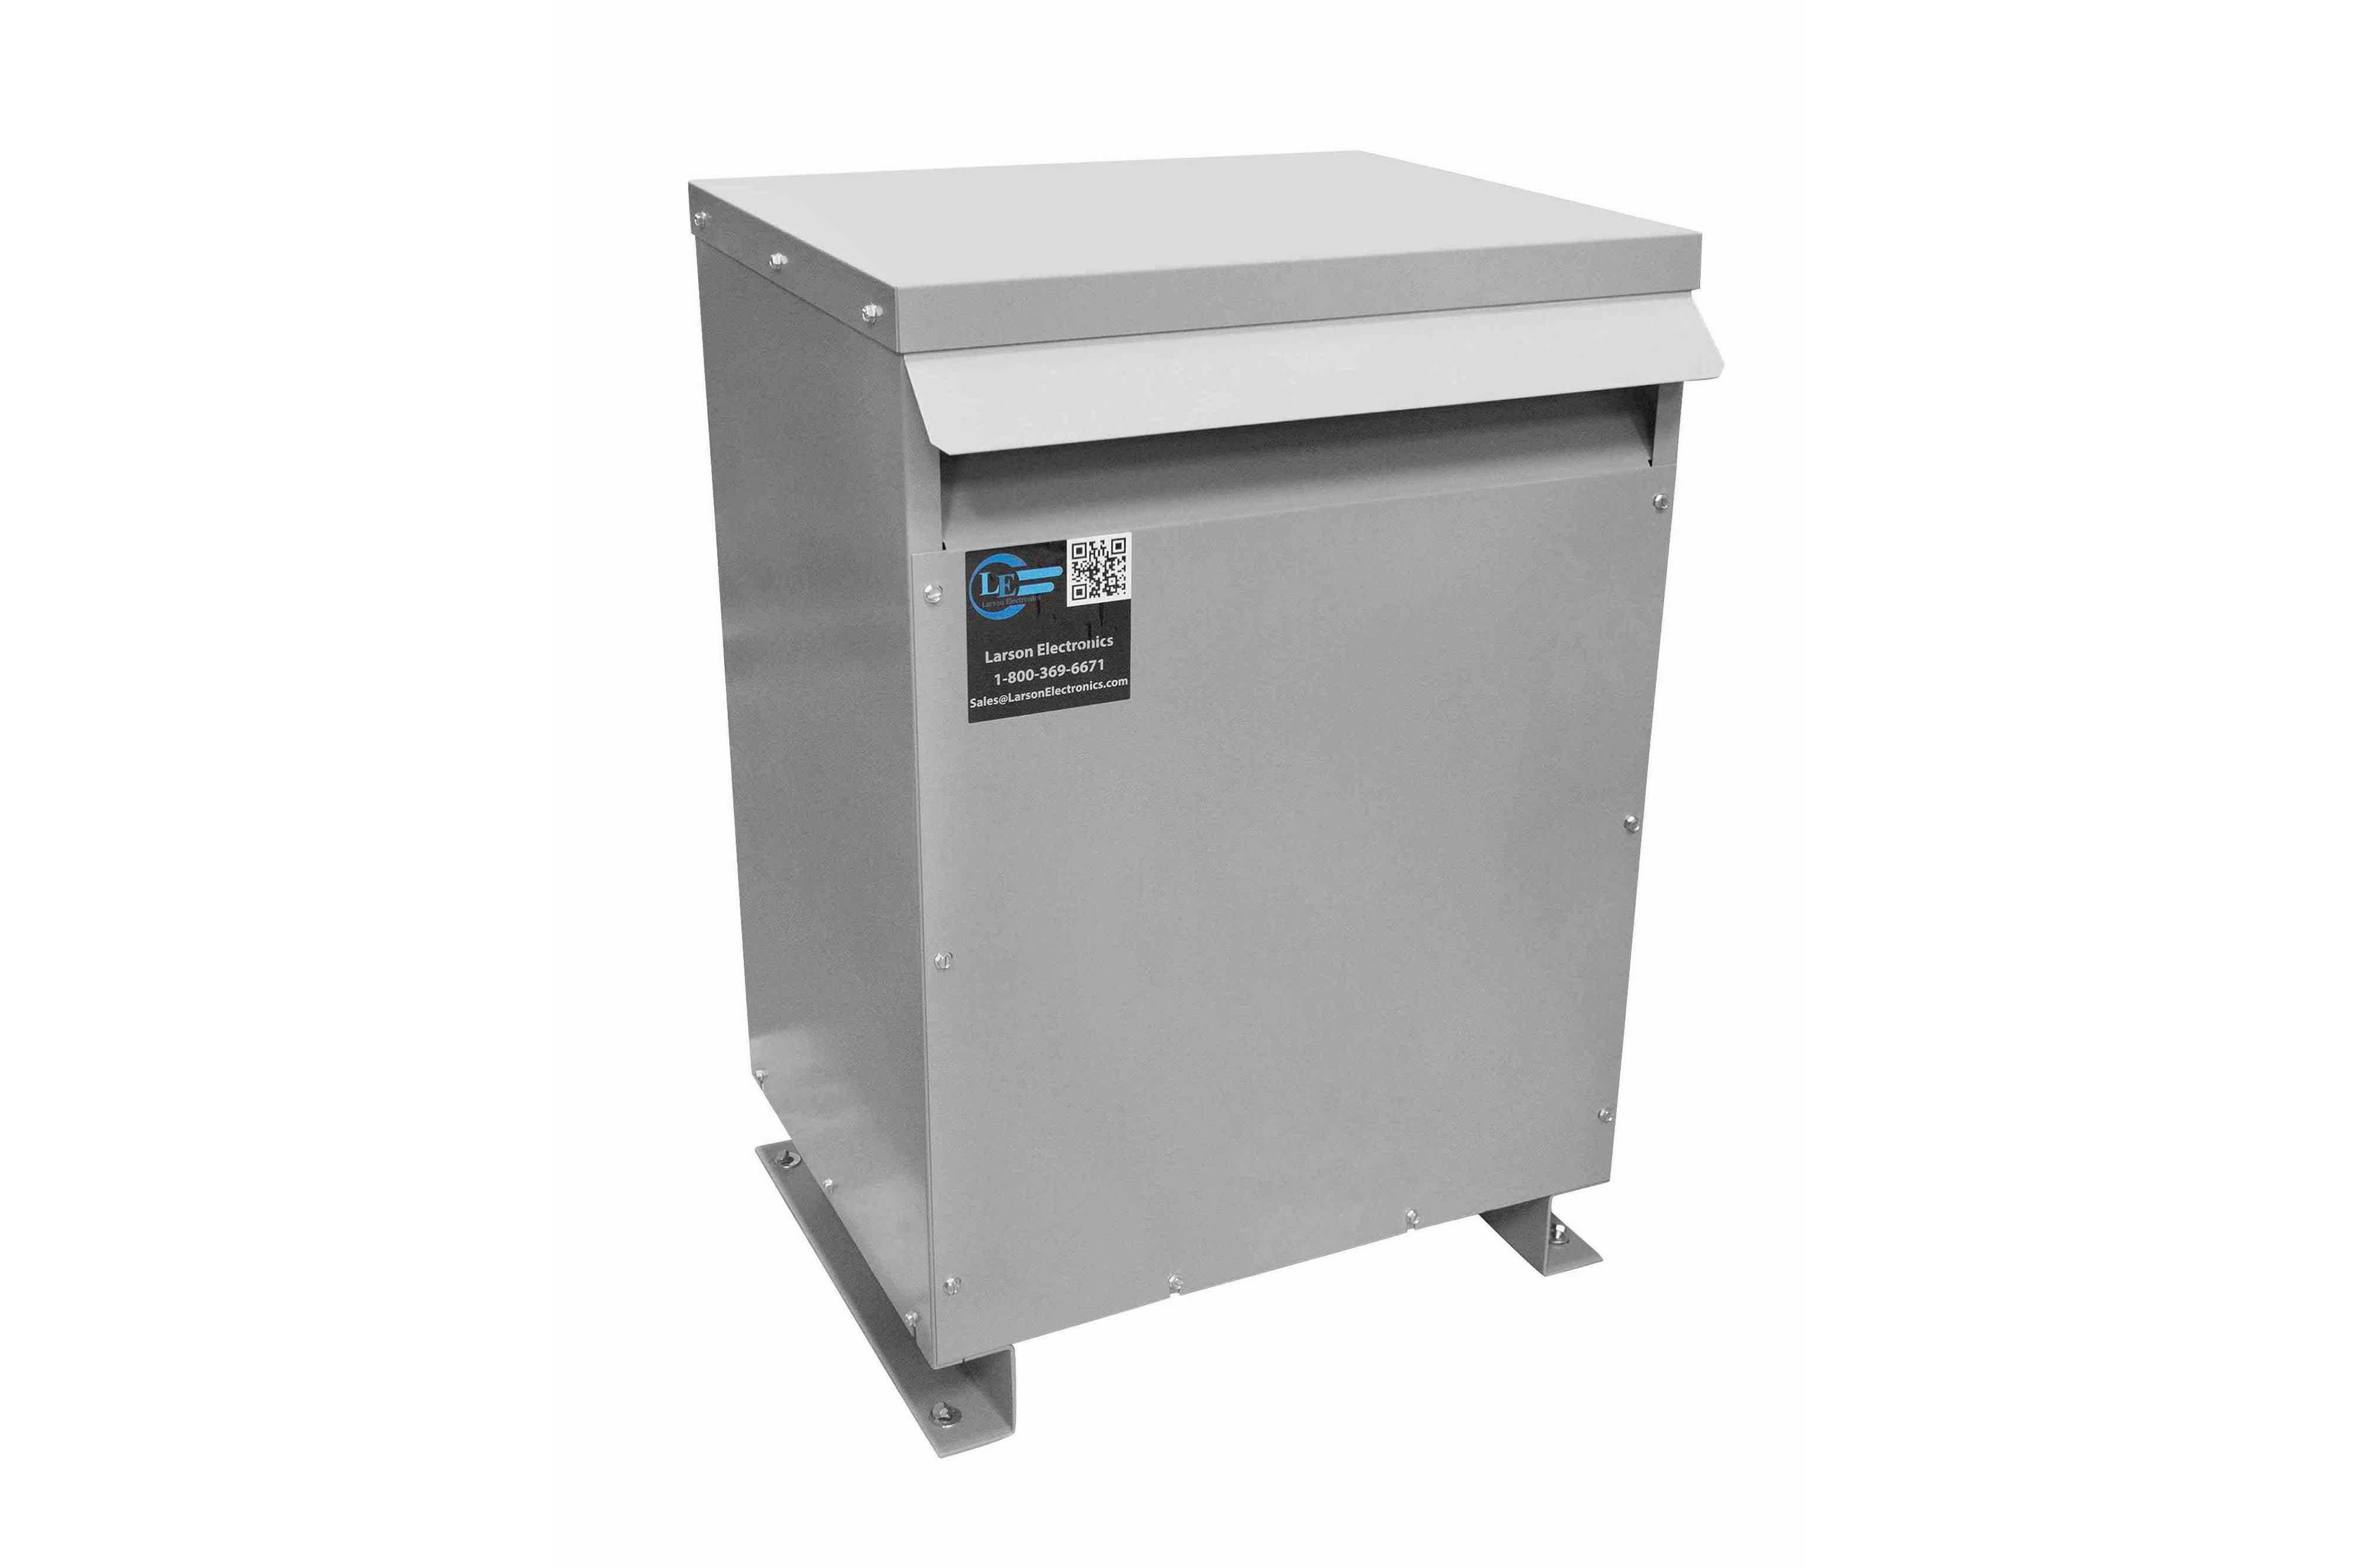 37.5 kVA 3PH Isolation Transformer, 208V Wye Primary, 240V/120 Delta Secondary, N3R, Ventilated, 60 Hz